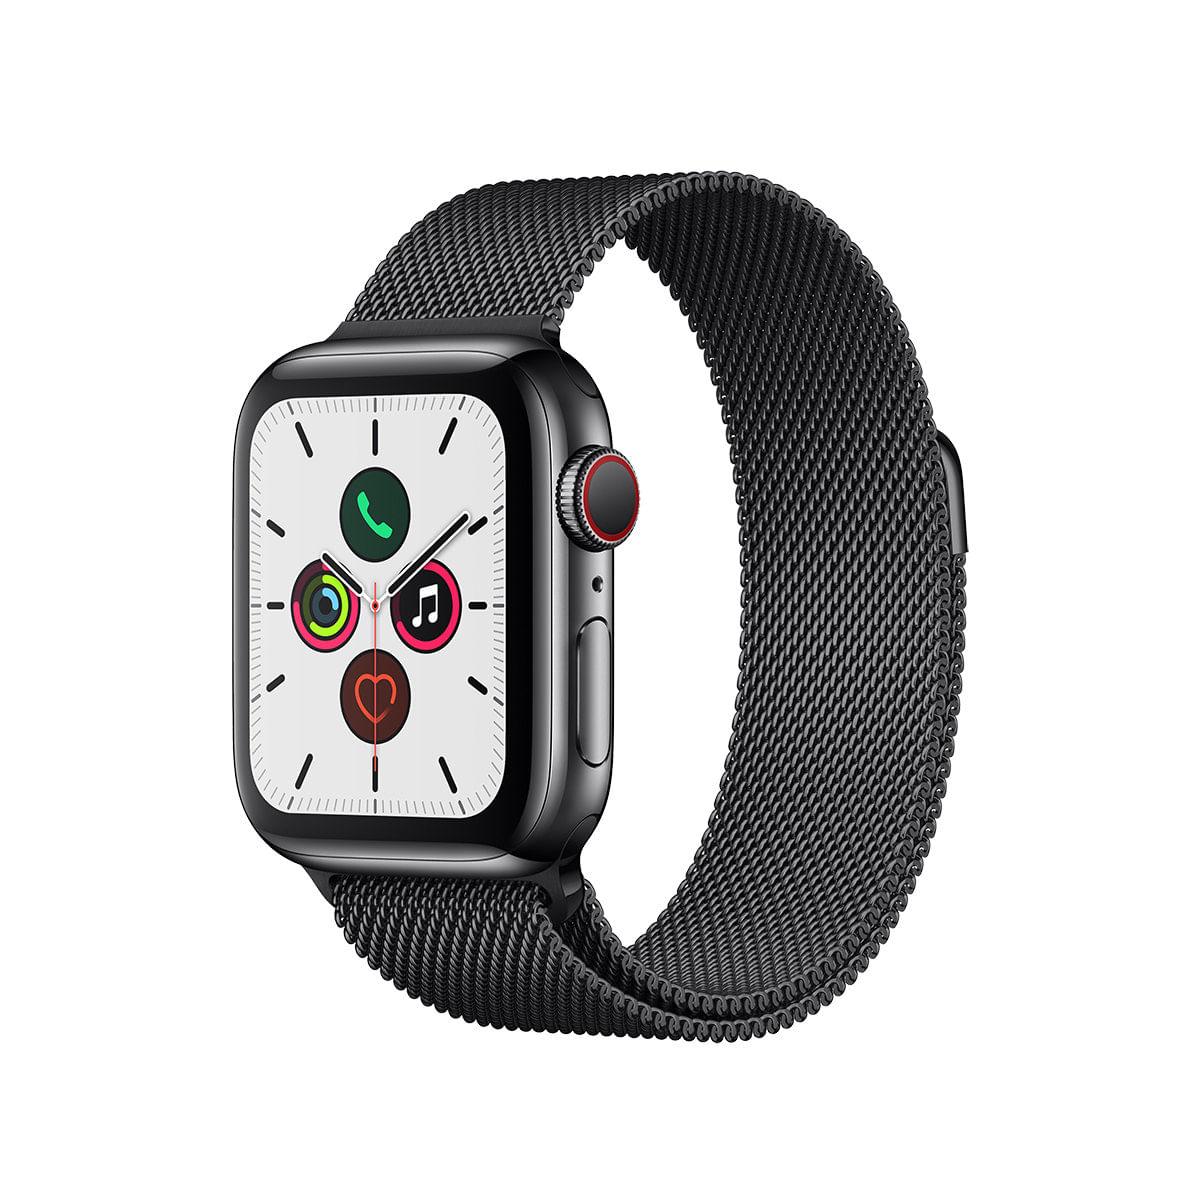 Imagem de Apple Watch Series 5 Cellular + GPS 40 mm